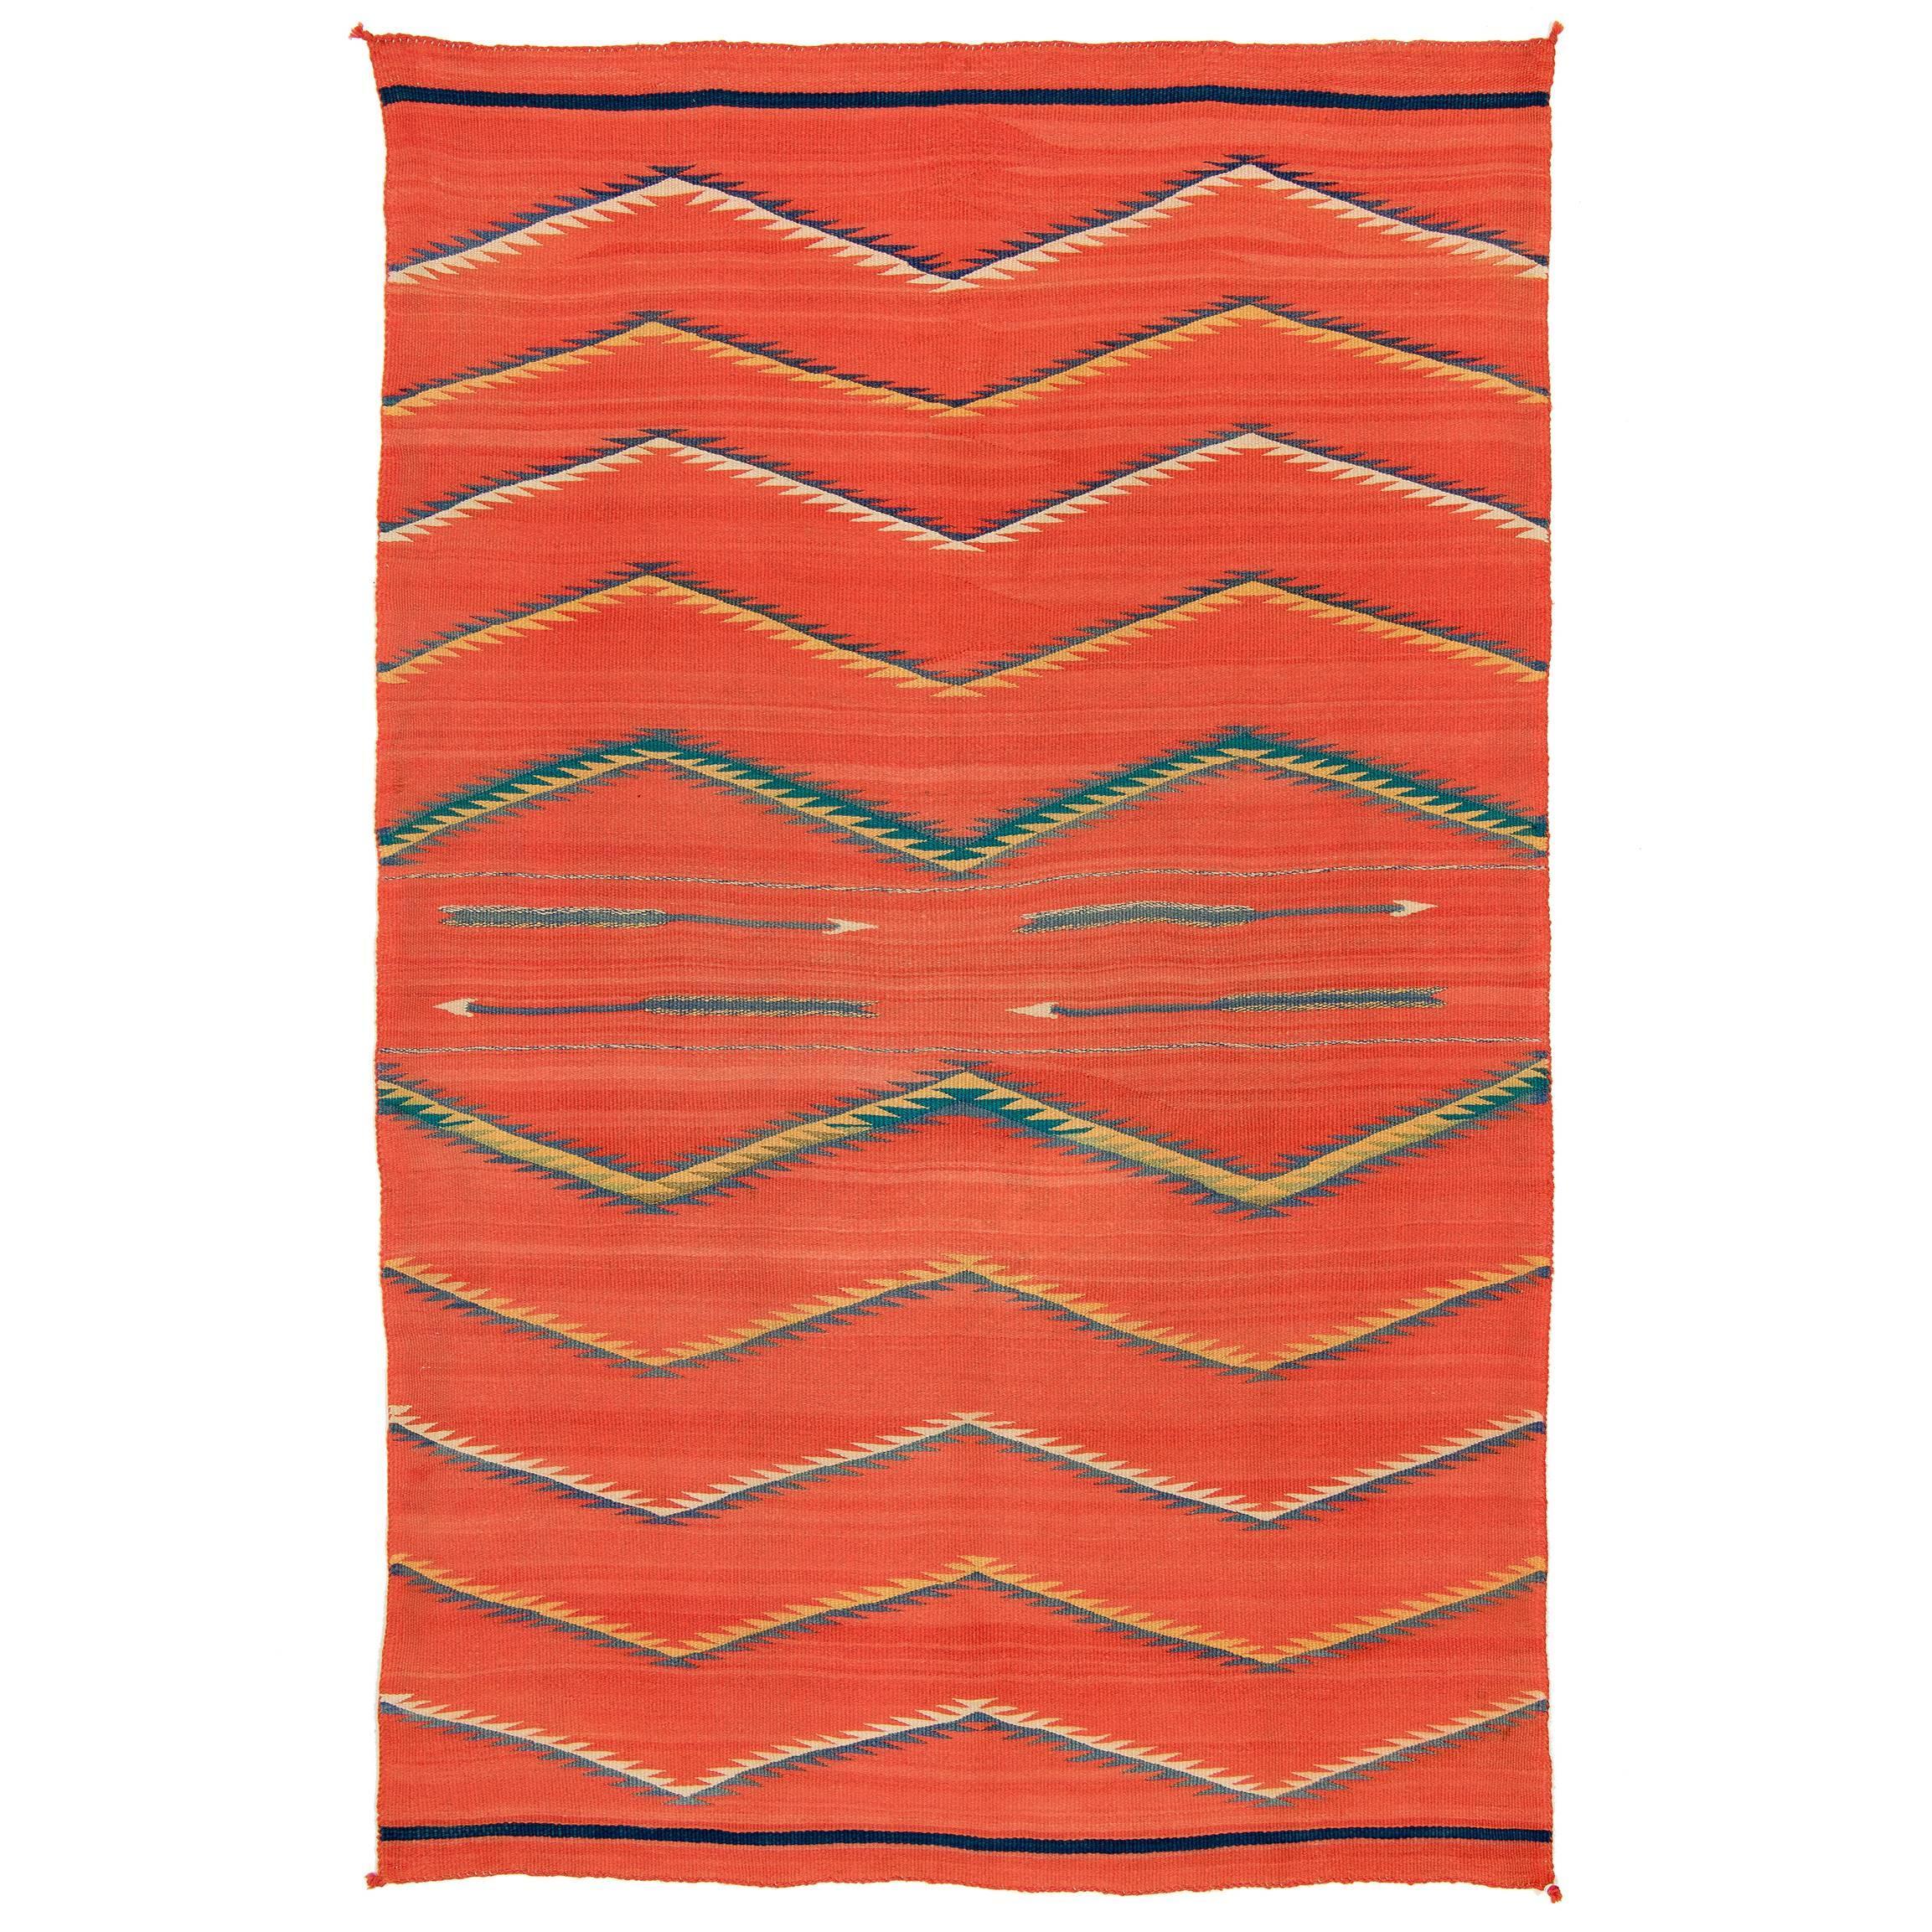 Native American Transitional Blanket, Navajo, circa 1875-1900